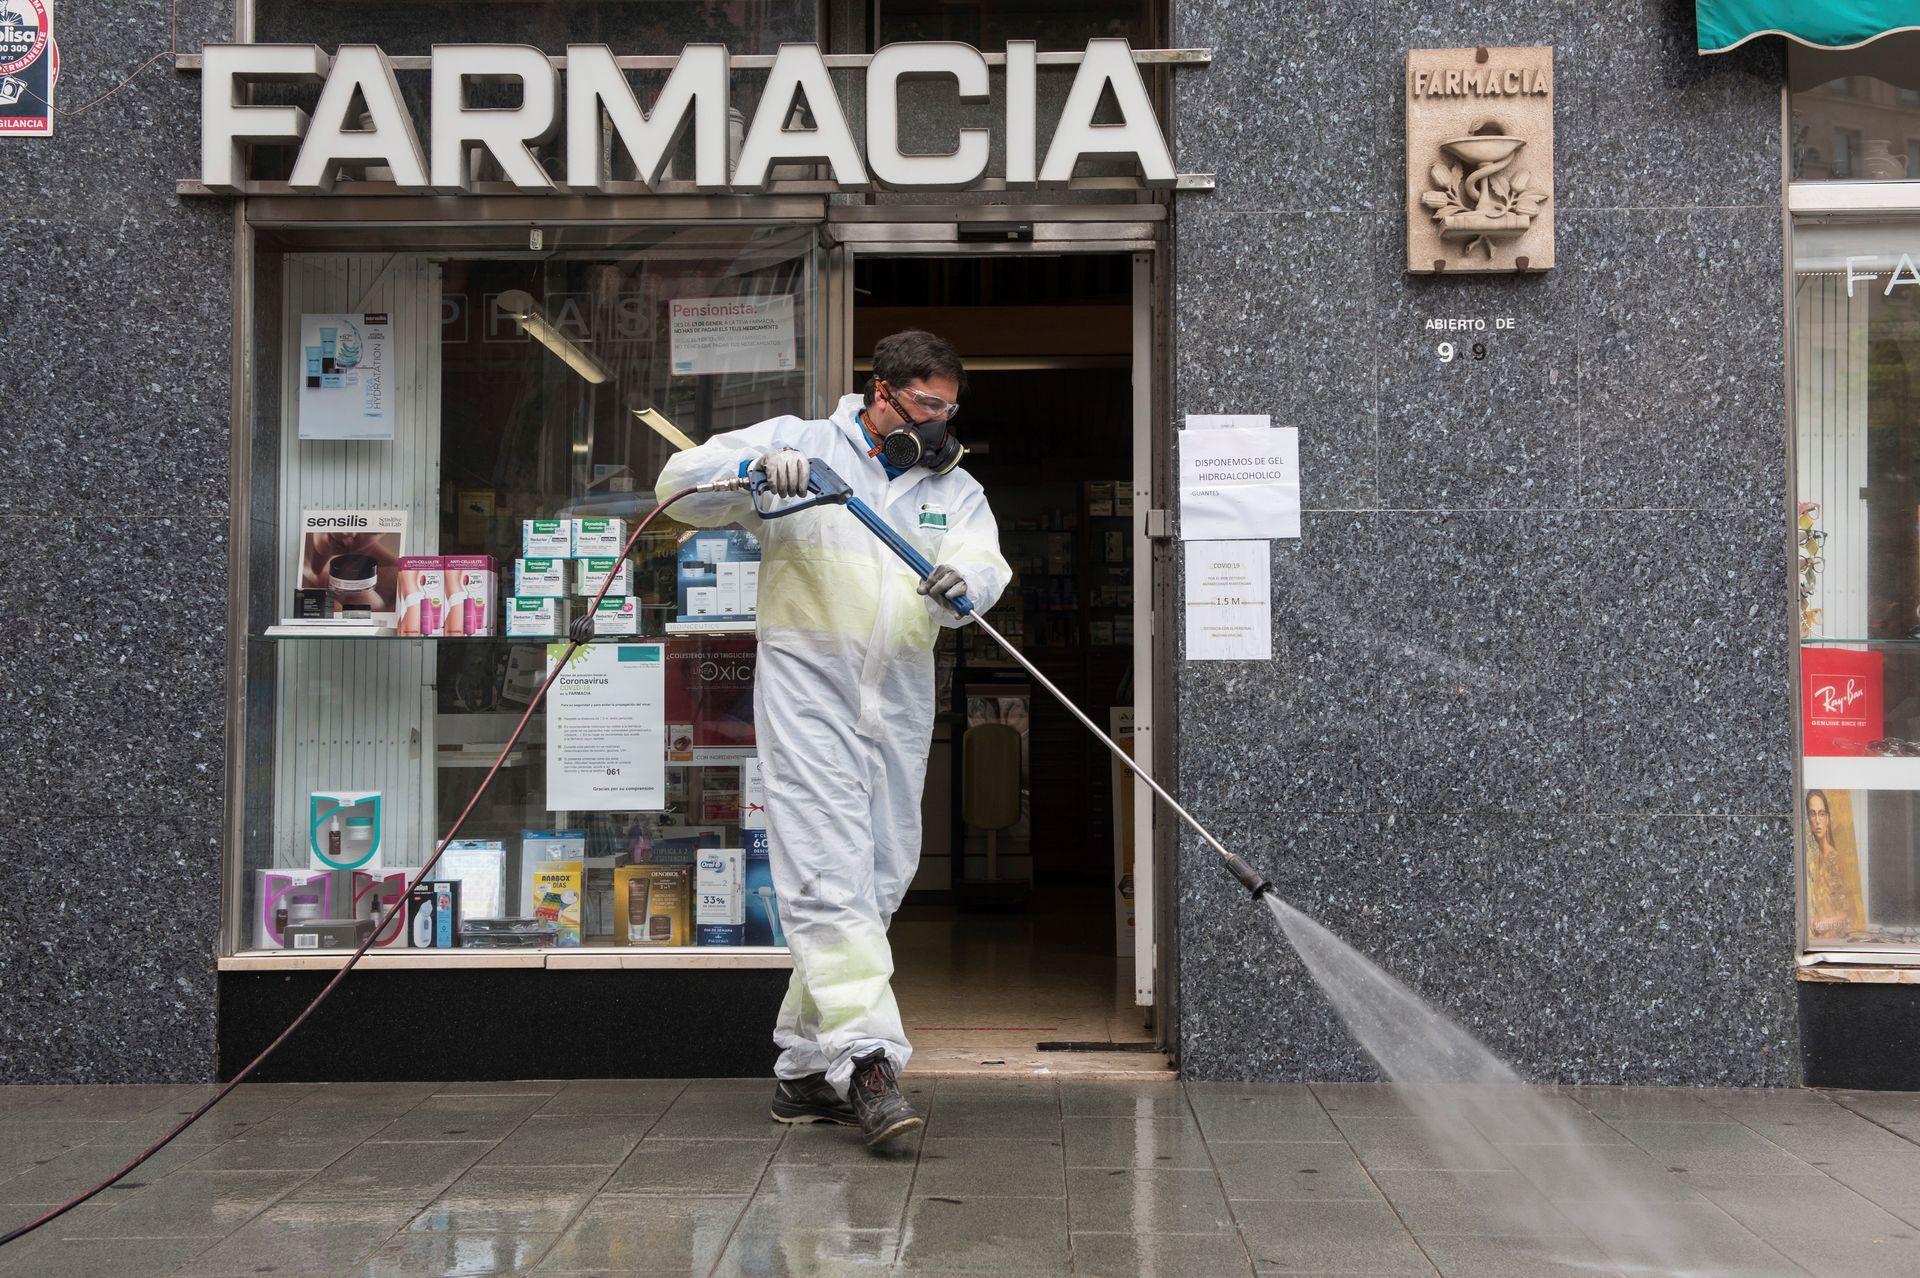 farmacia-090420.jpg